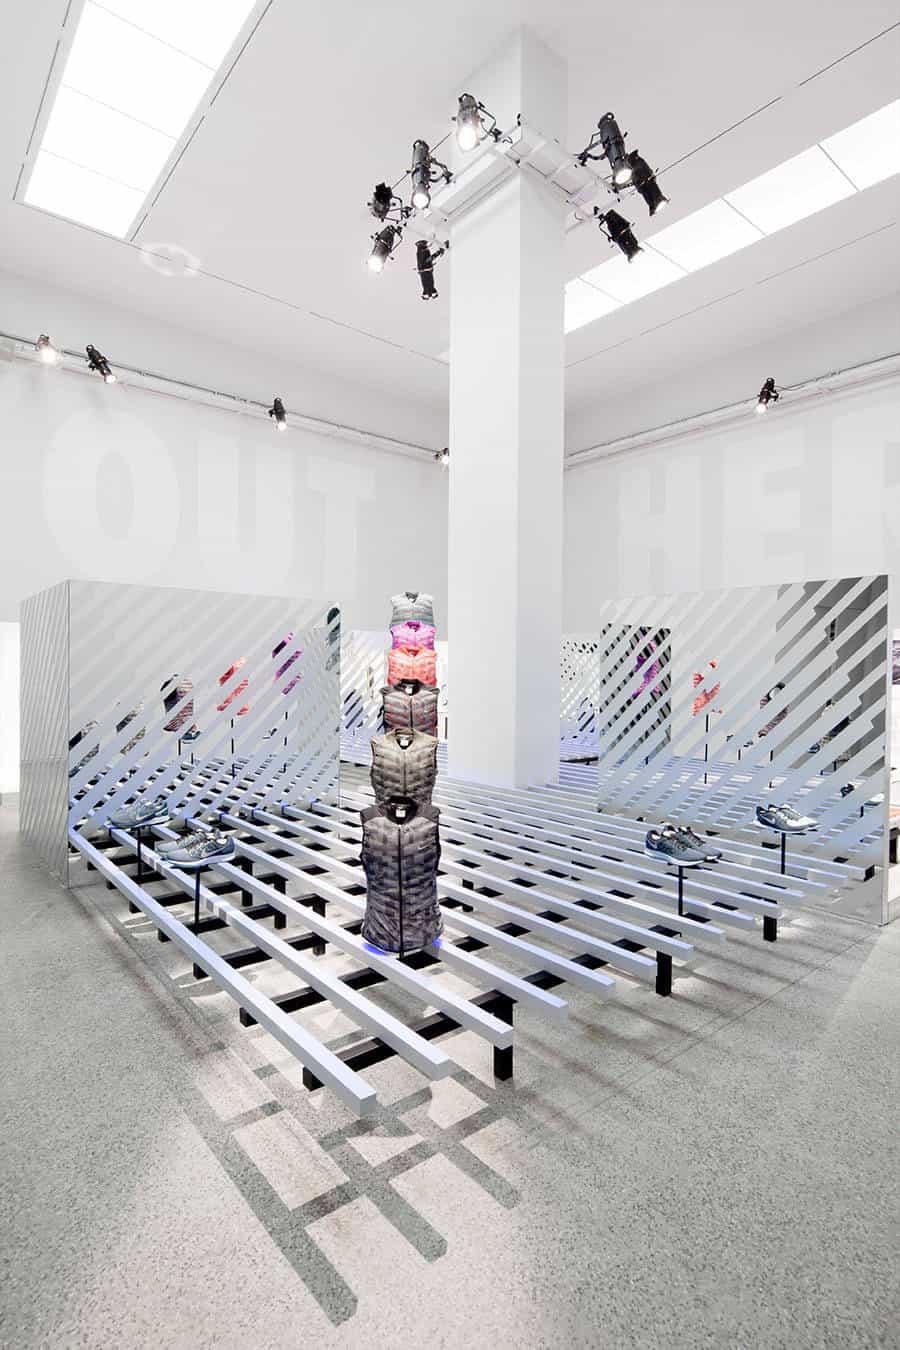 Nike exhibition in Bejing's Art Gallery